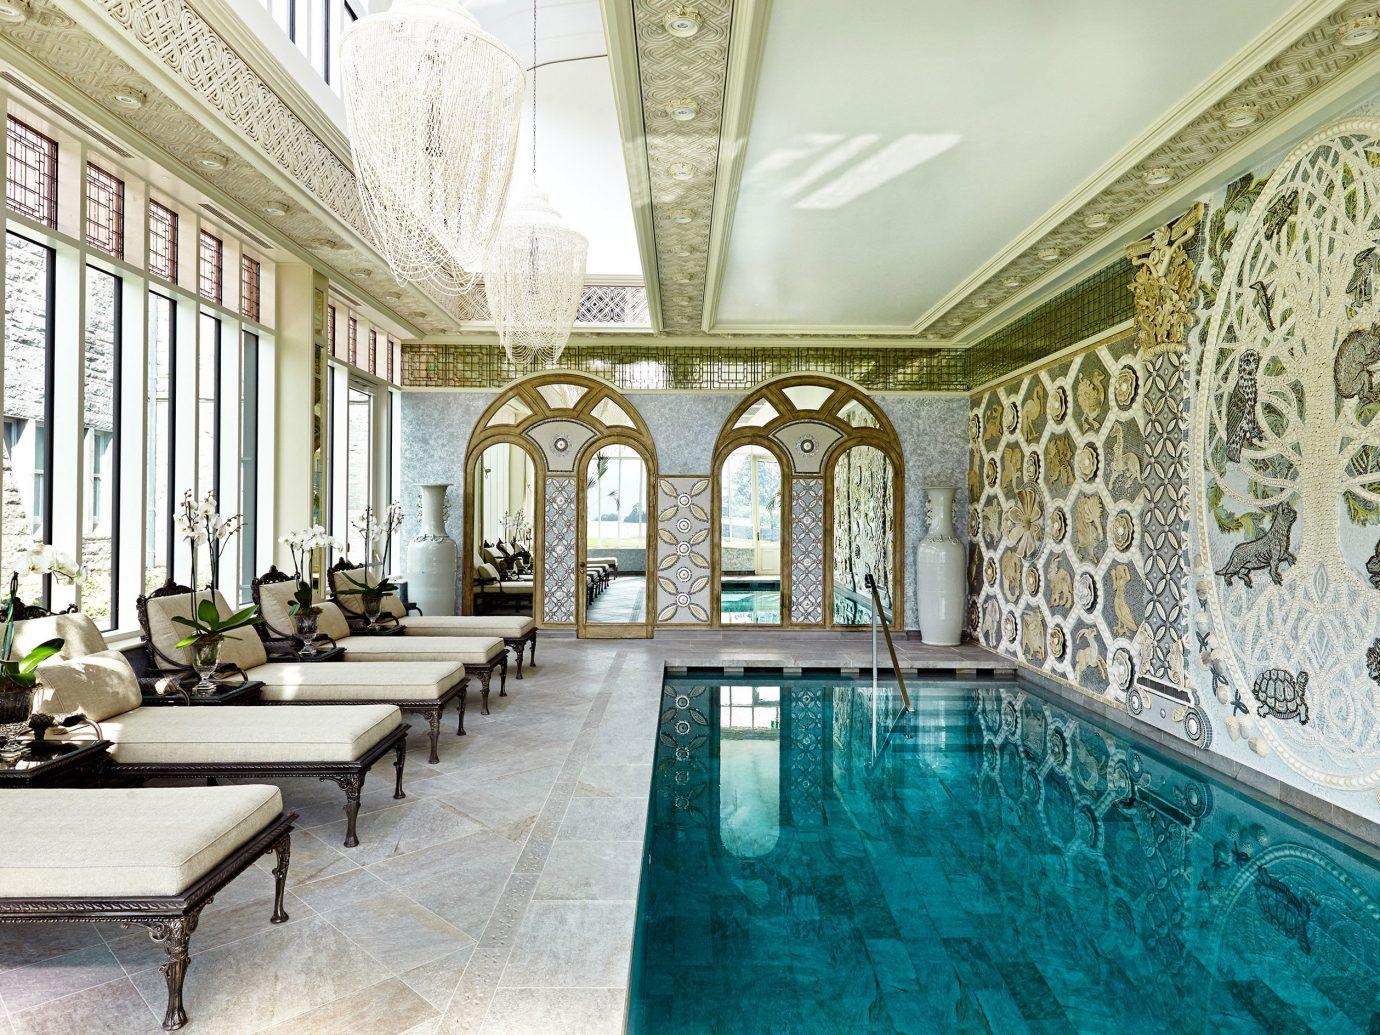 Trip Ideas indoor property estate room building mansion palace interior design Lobby Villa stone